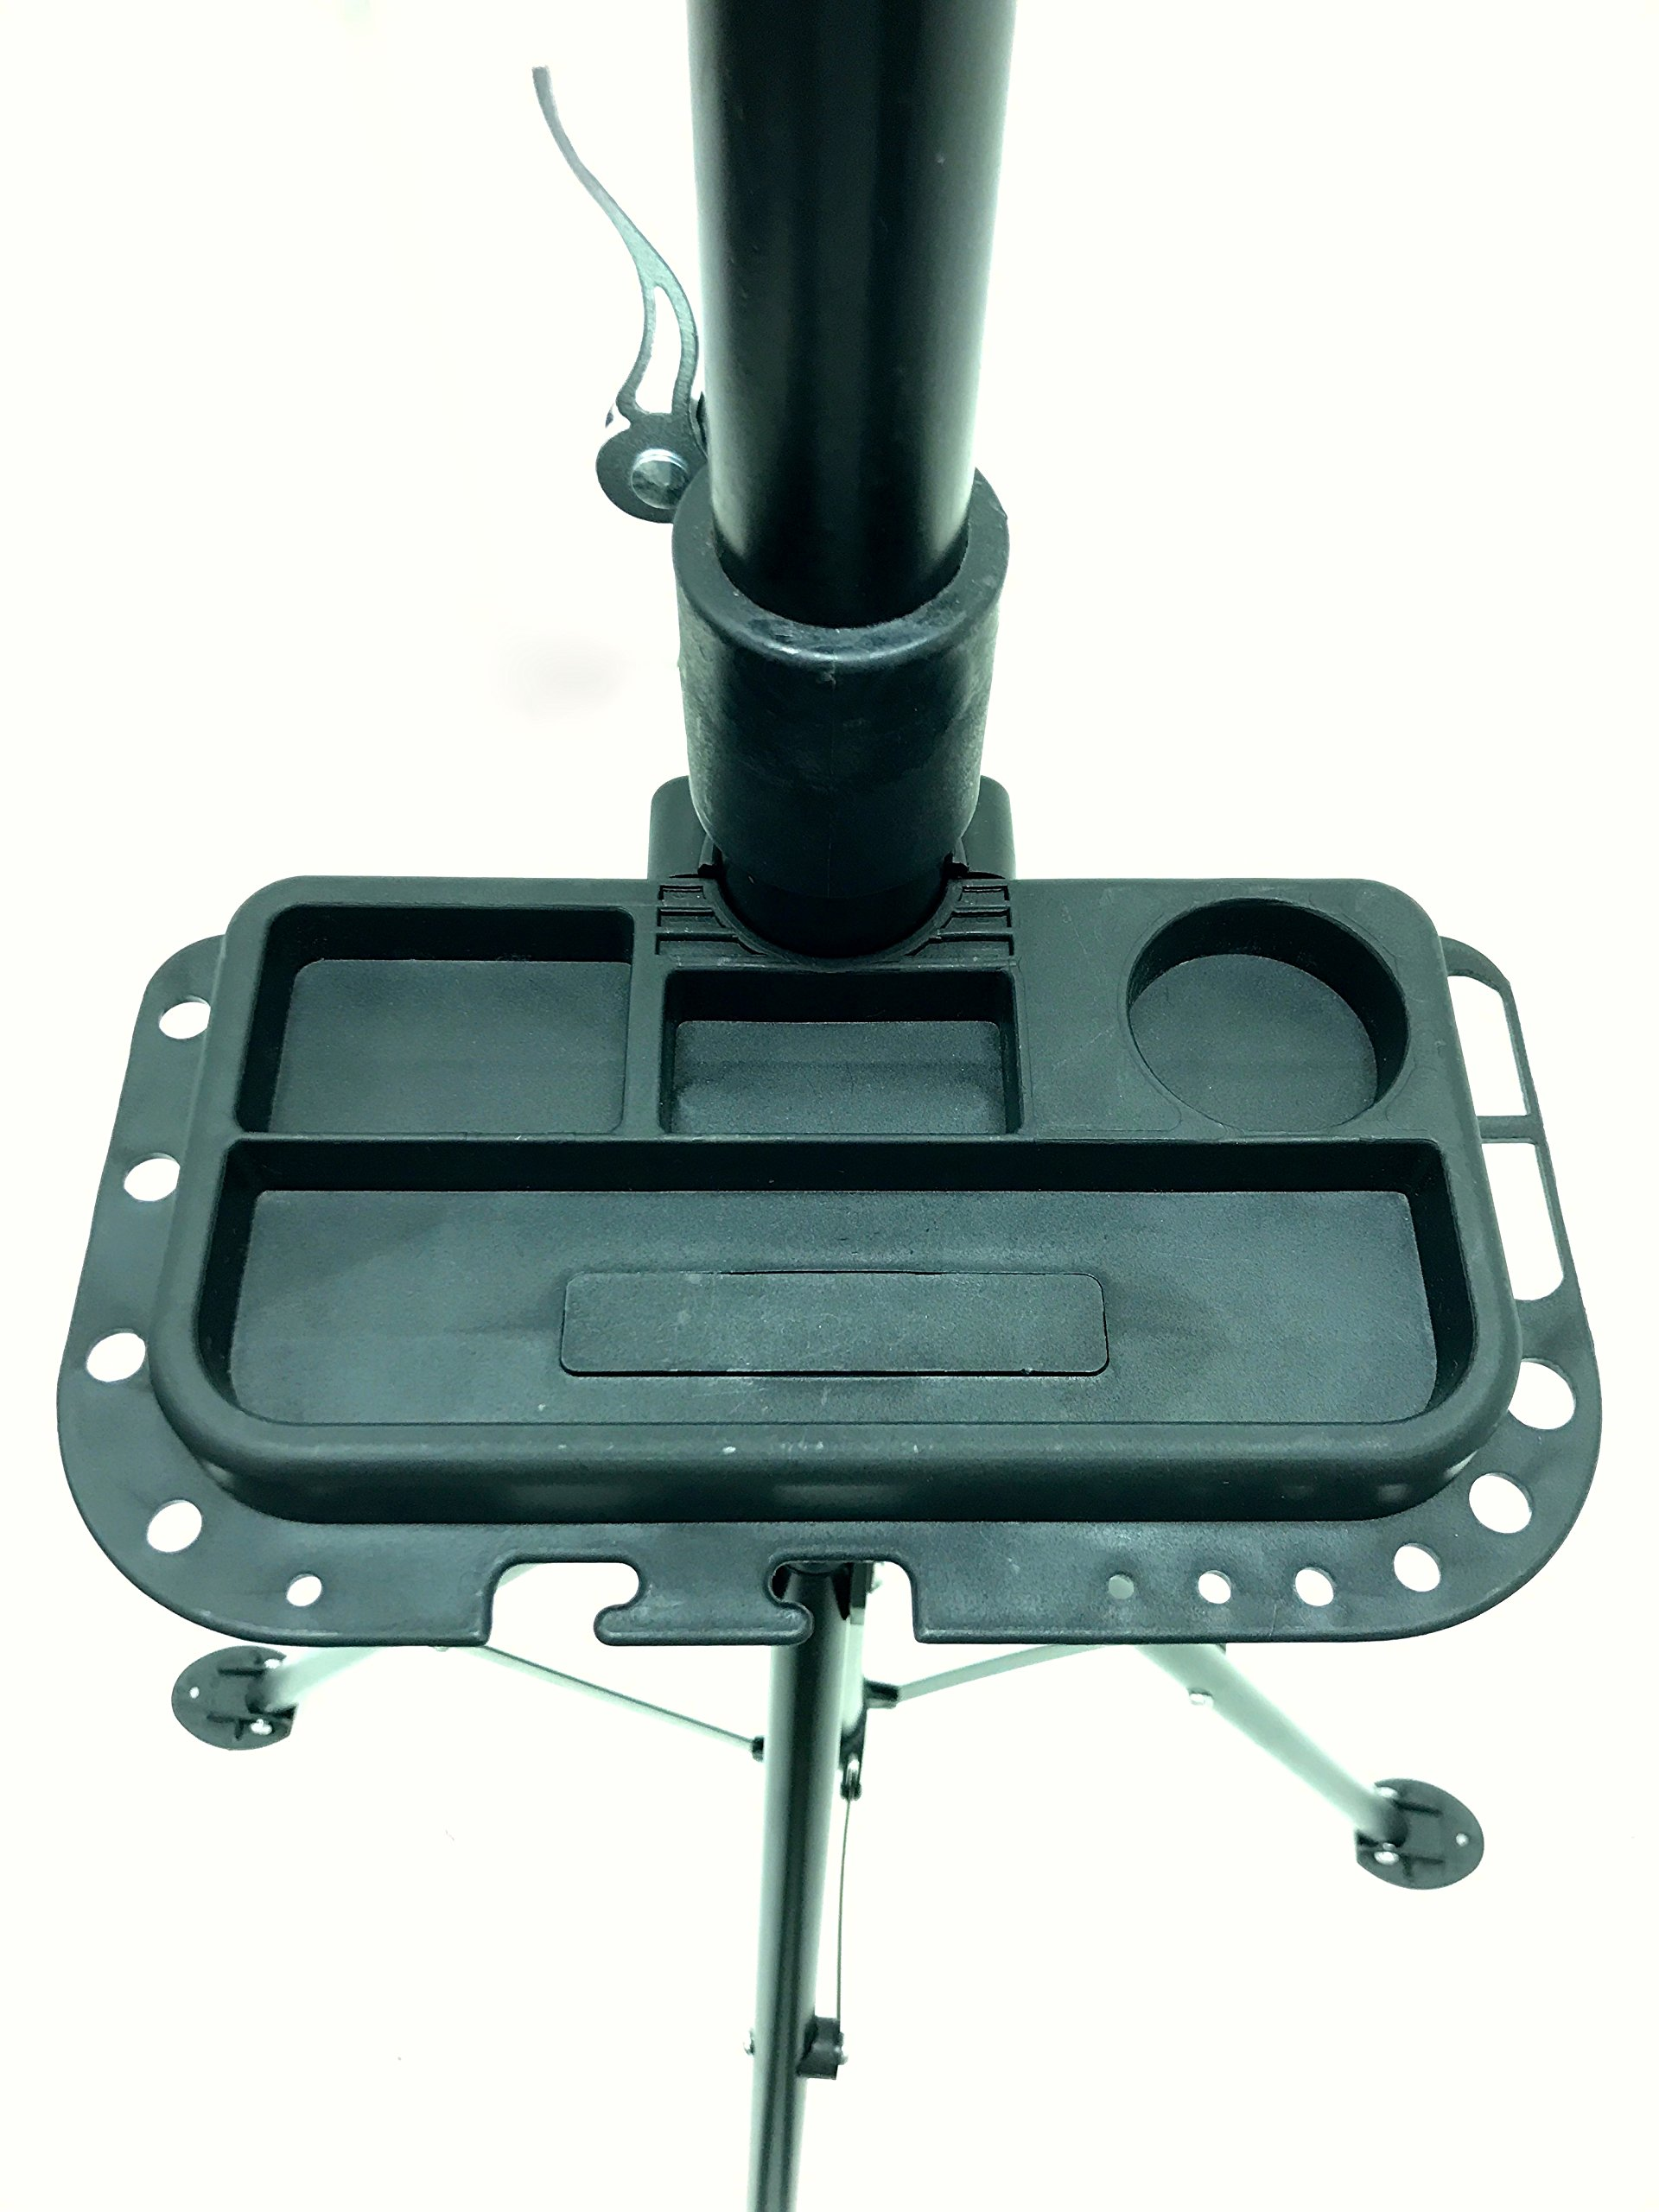 MaxxHaul 80725 Bike Repair Stand/Display with Adjustable Height & 360 Deg. Rotating Head Clamp by MaxxHaul (Image #3)